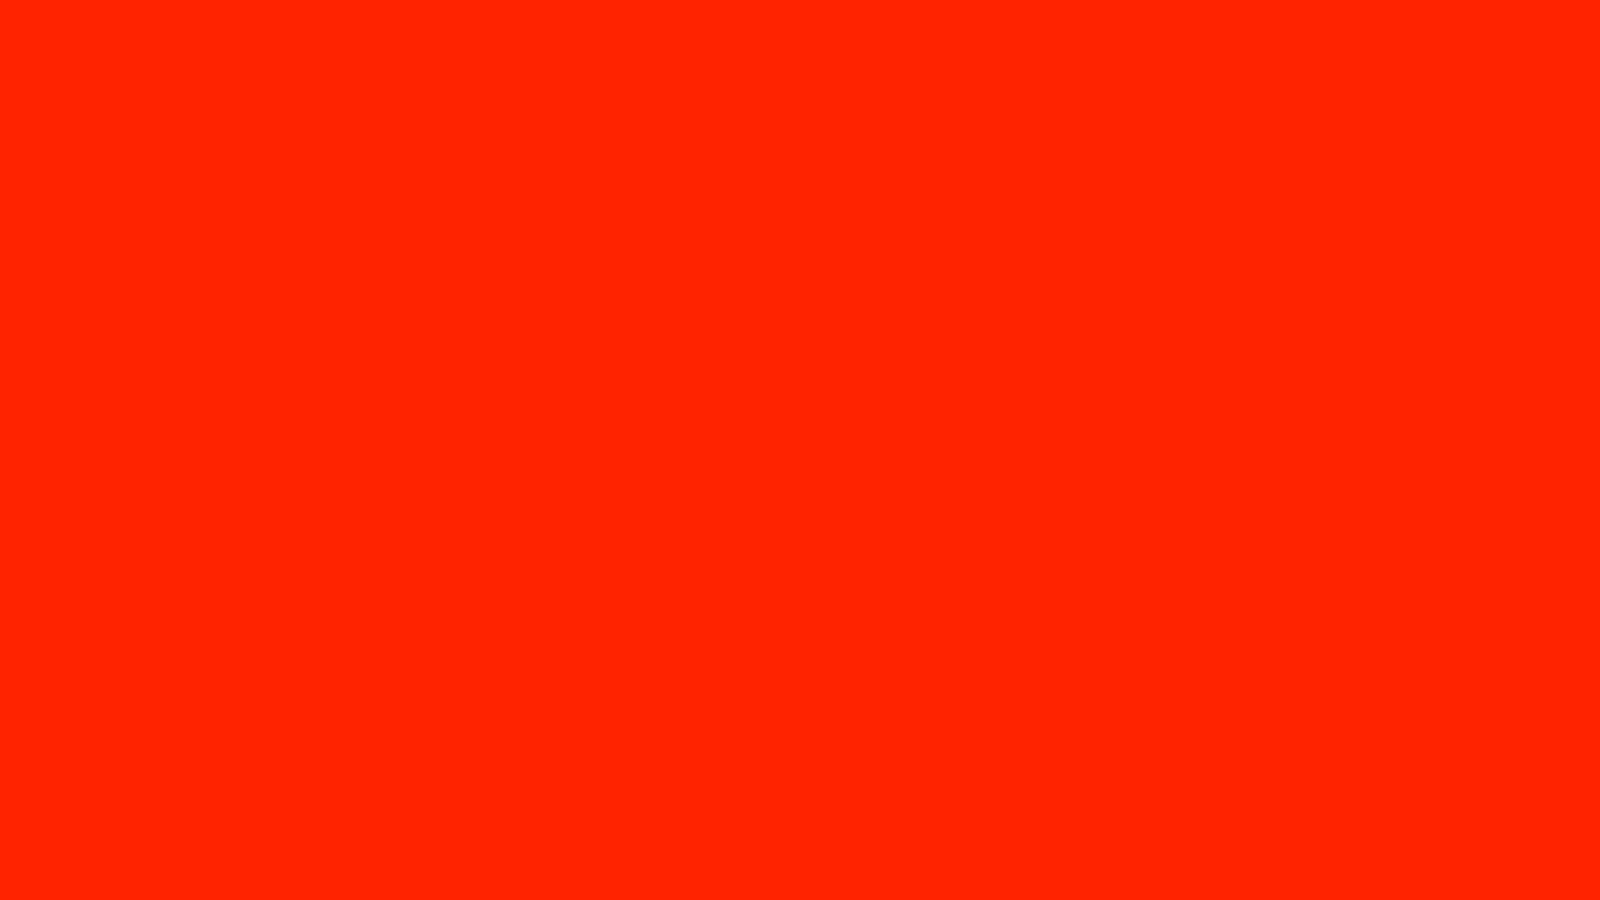 1600x900 Scarlet Solid Color Background